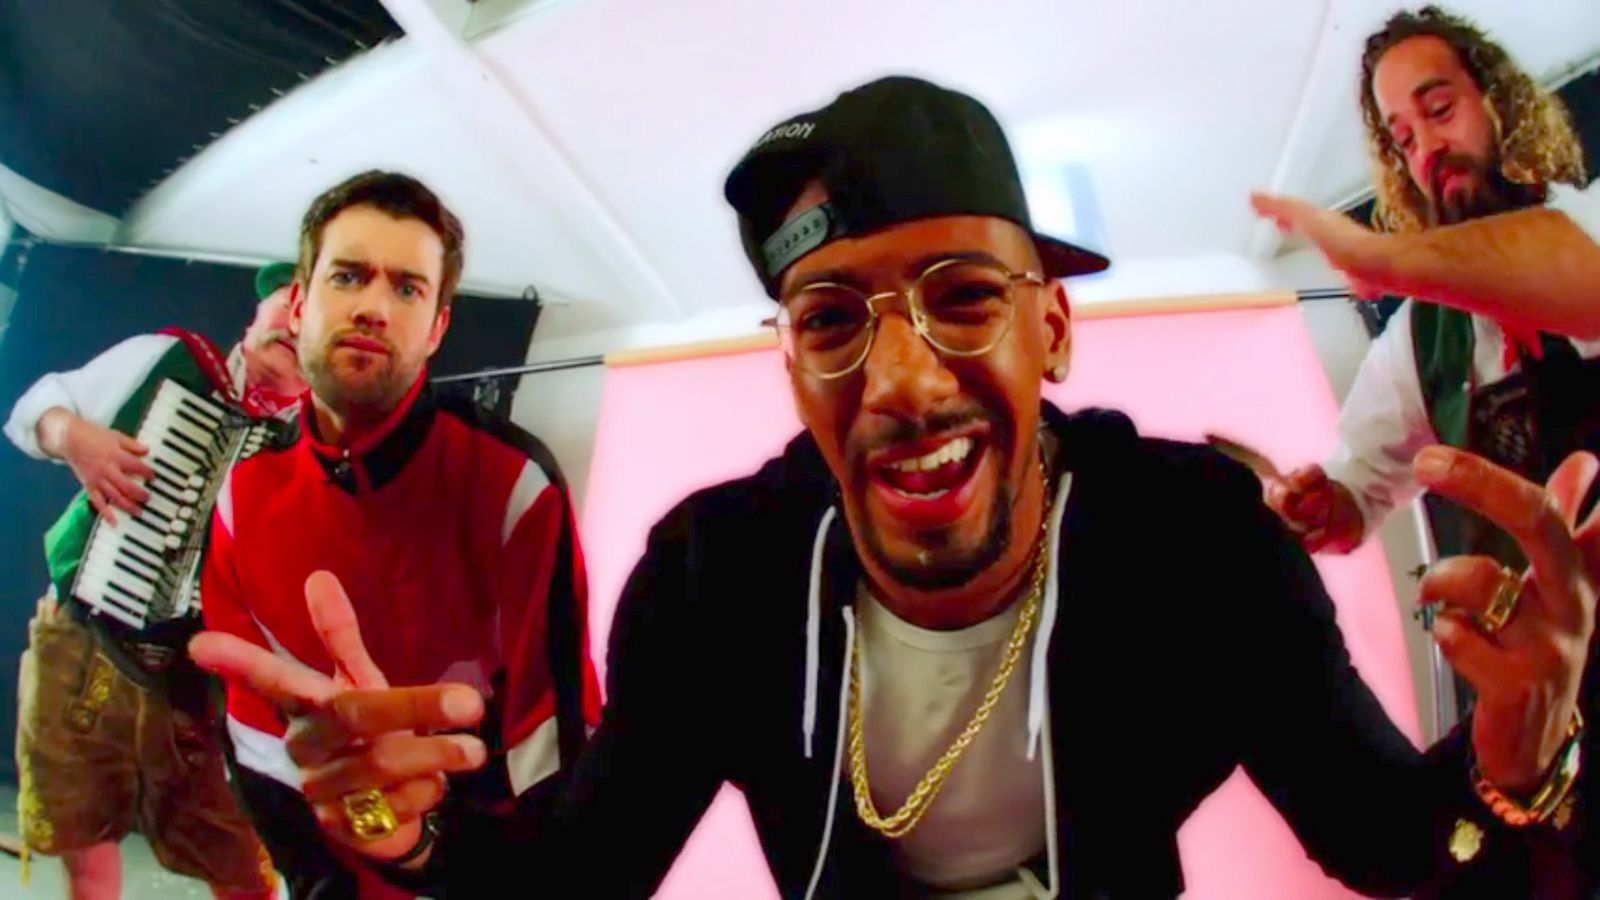 NUR ALS ZITAT Screenshot Jack Whitehall/ Jerome Boateng Rap/ YouTube